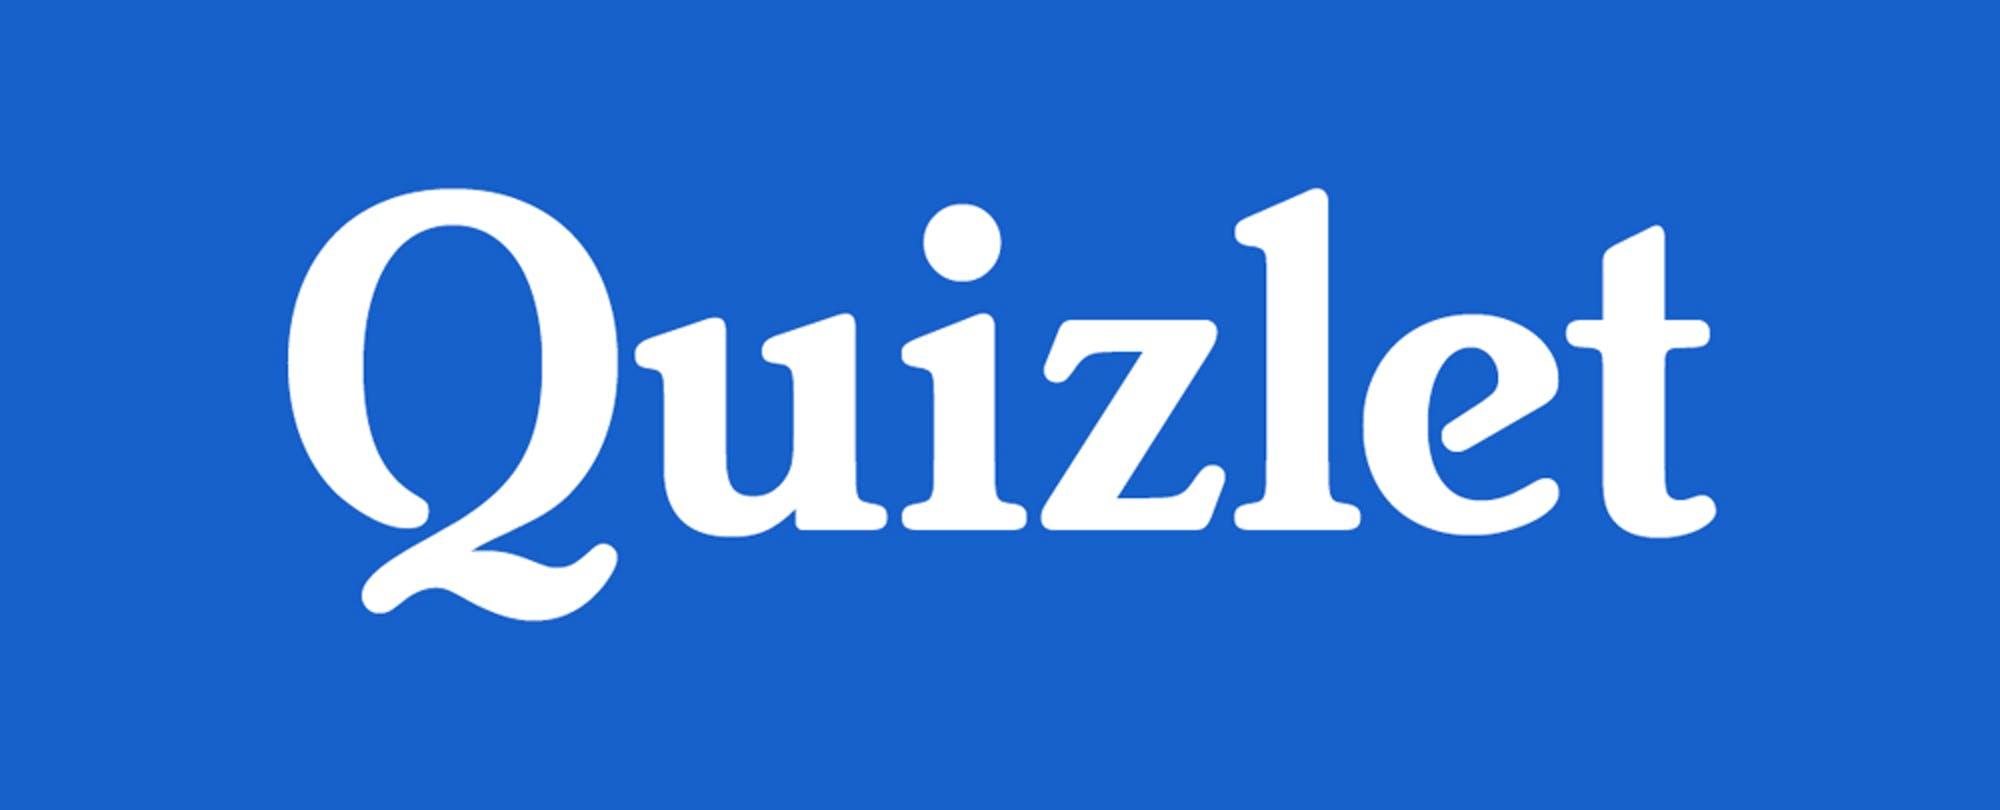 Bootstrapped Since 2005, Quizlet Raises $12 Million to Reach 1 Billion Learners